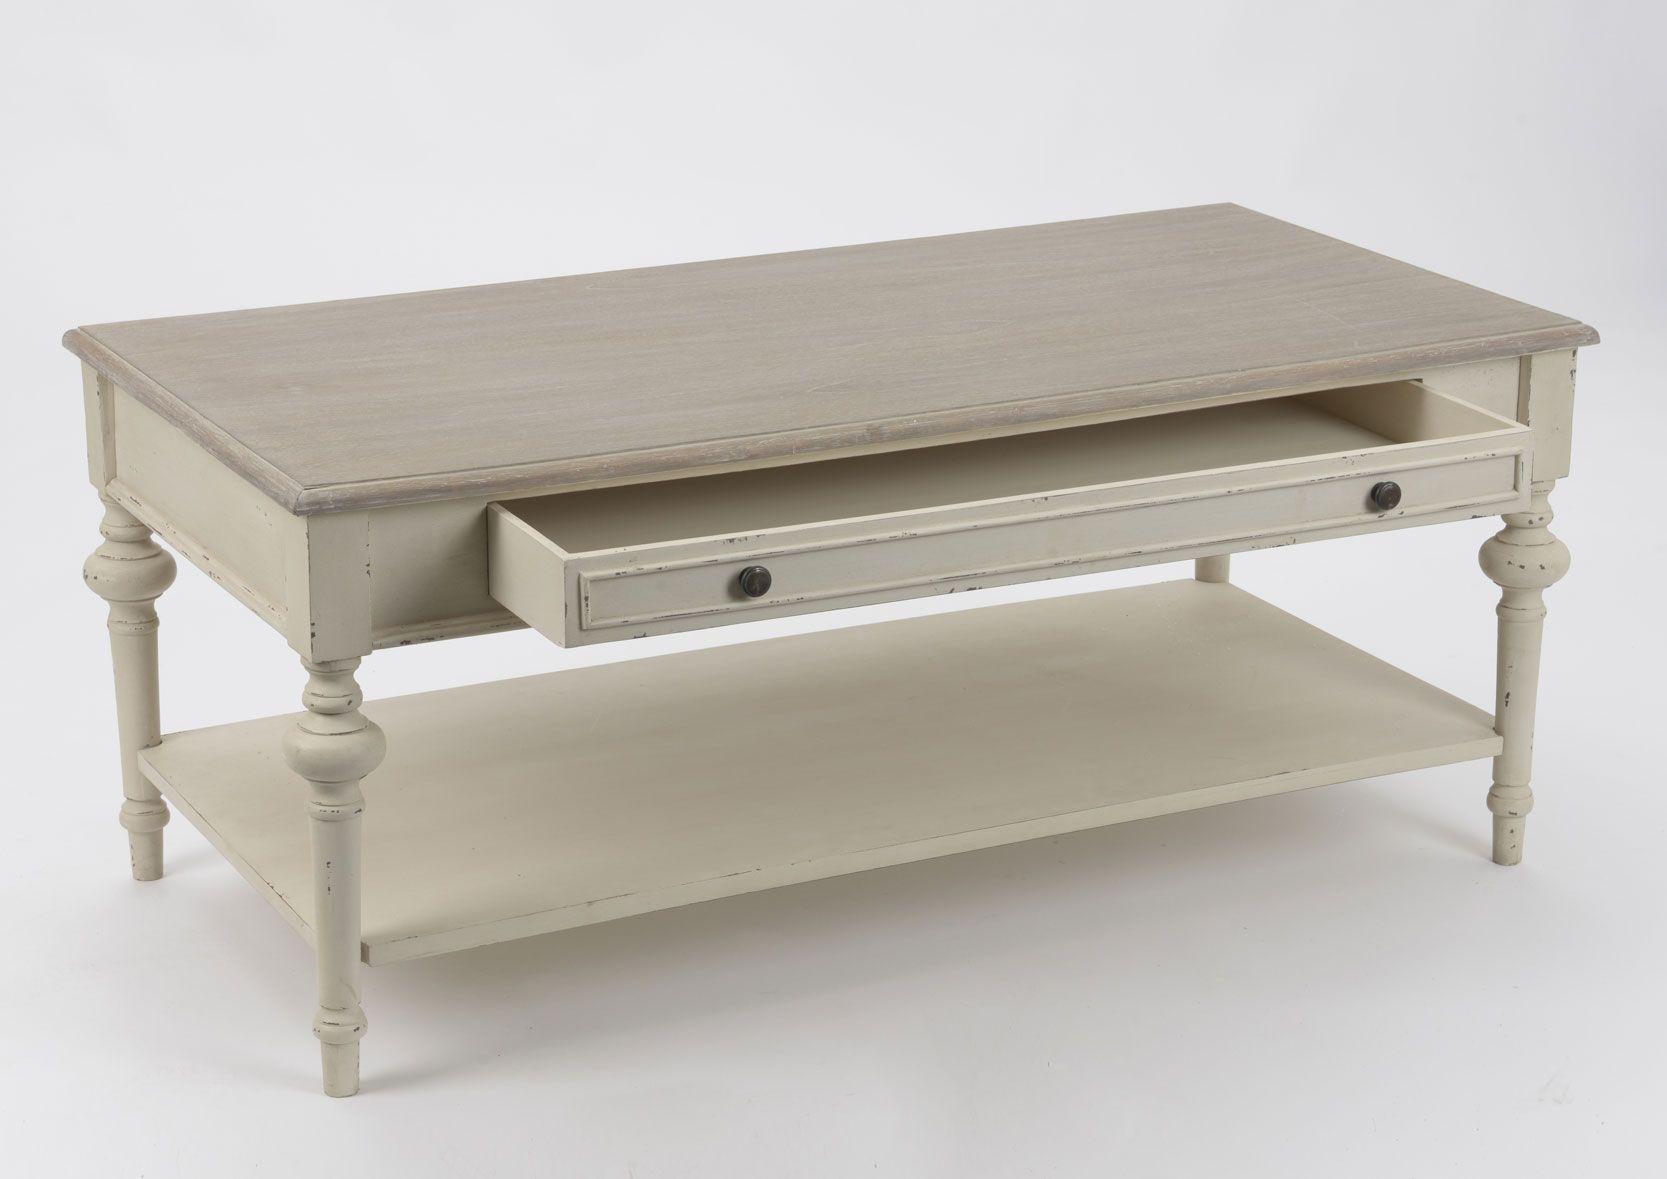 table basse avec tiroir legend. Black Bedroom Furniture Sets. Home Design Ideas